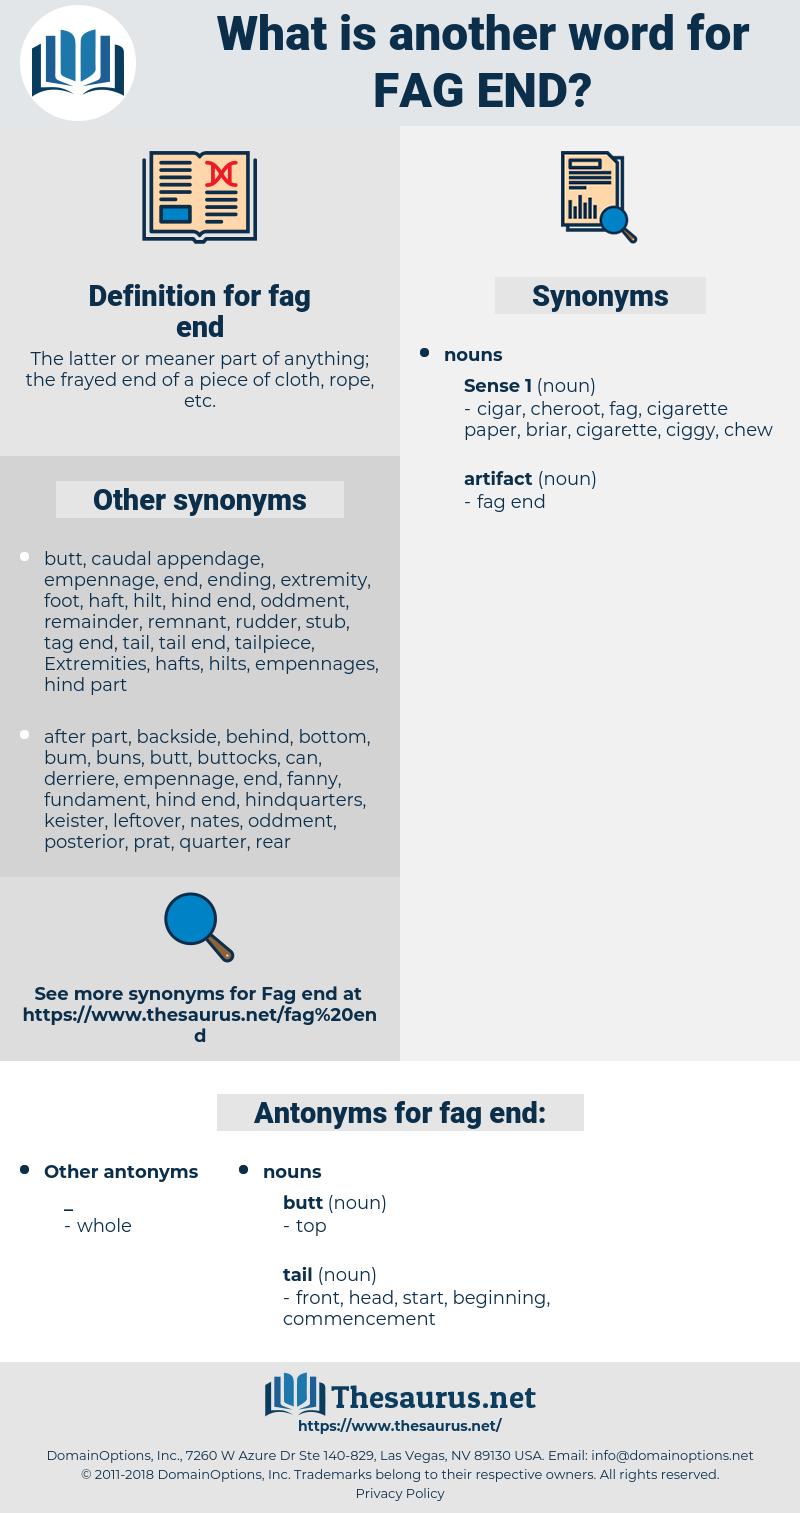 fag end, synonym fag end, another word for fag end, words like fag end, thesaurus fag end